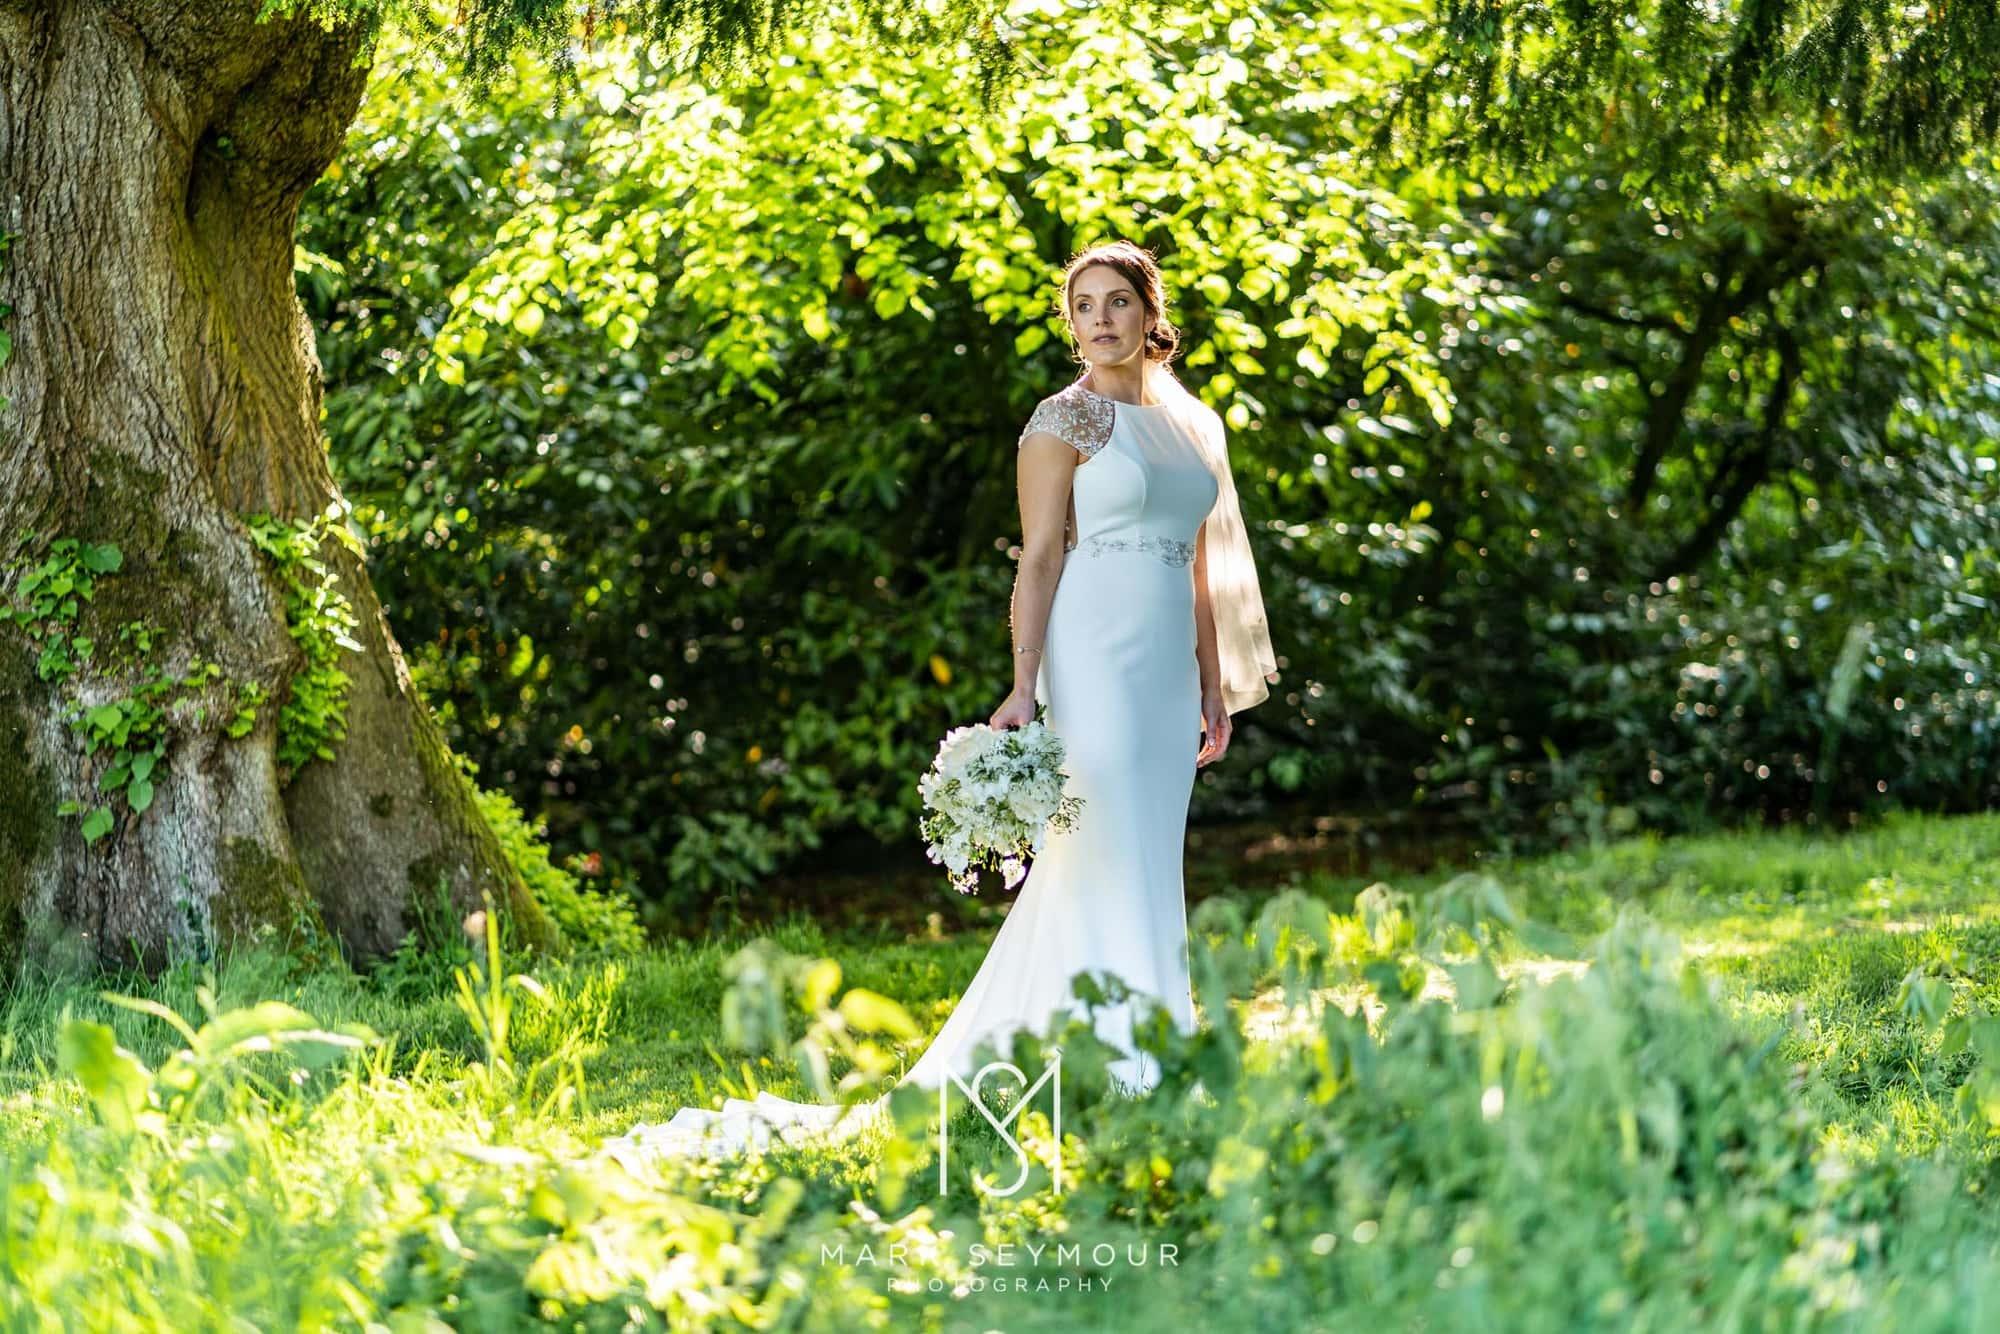 Hampden House Wedding Photography - Hannah and Lee's wedding. 22